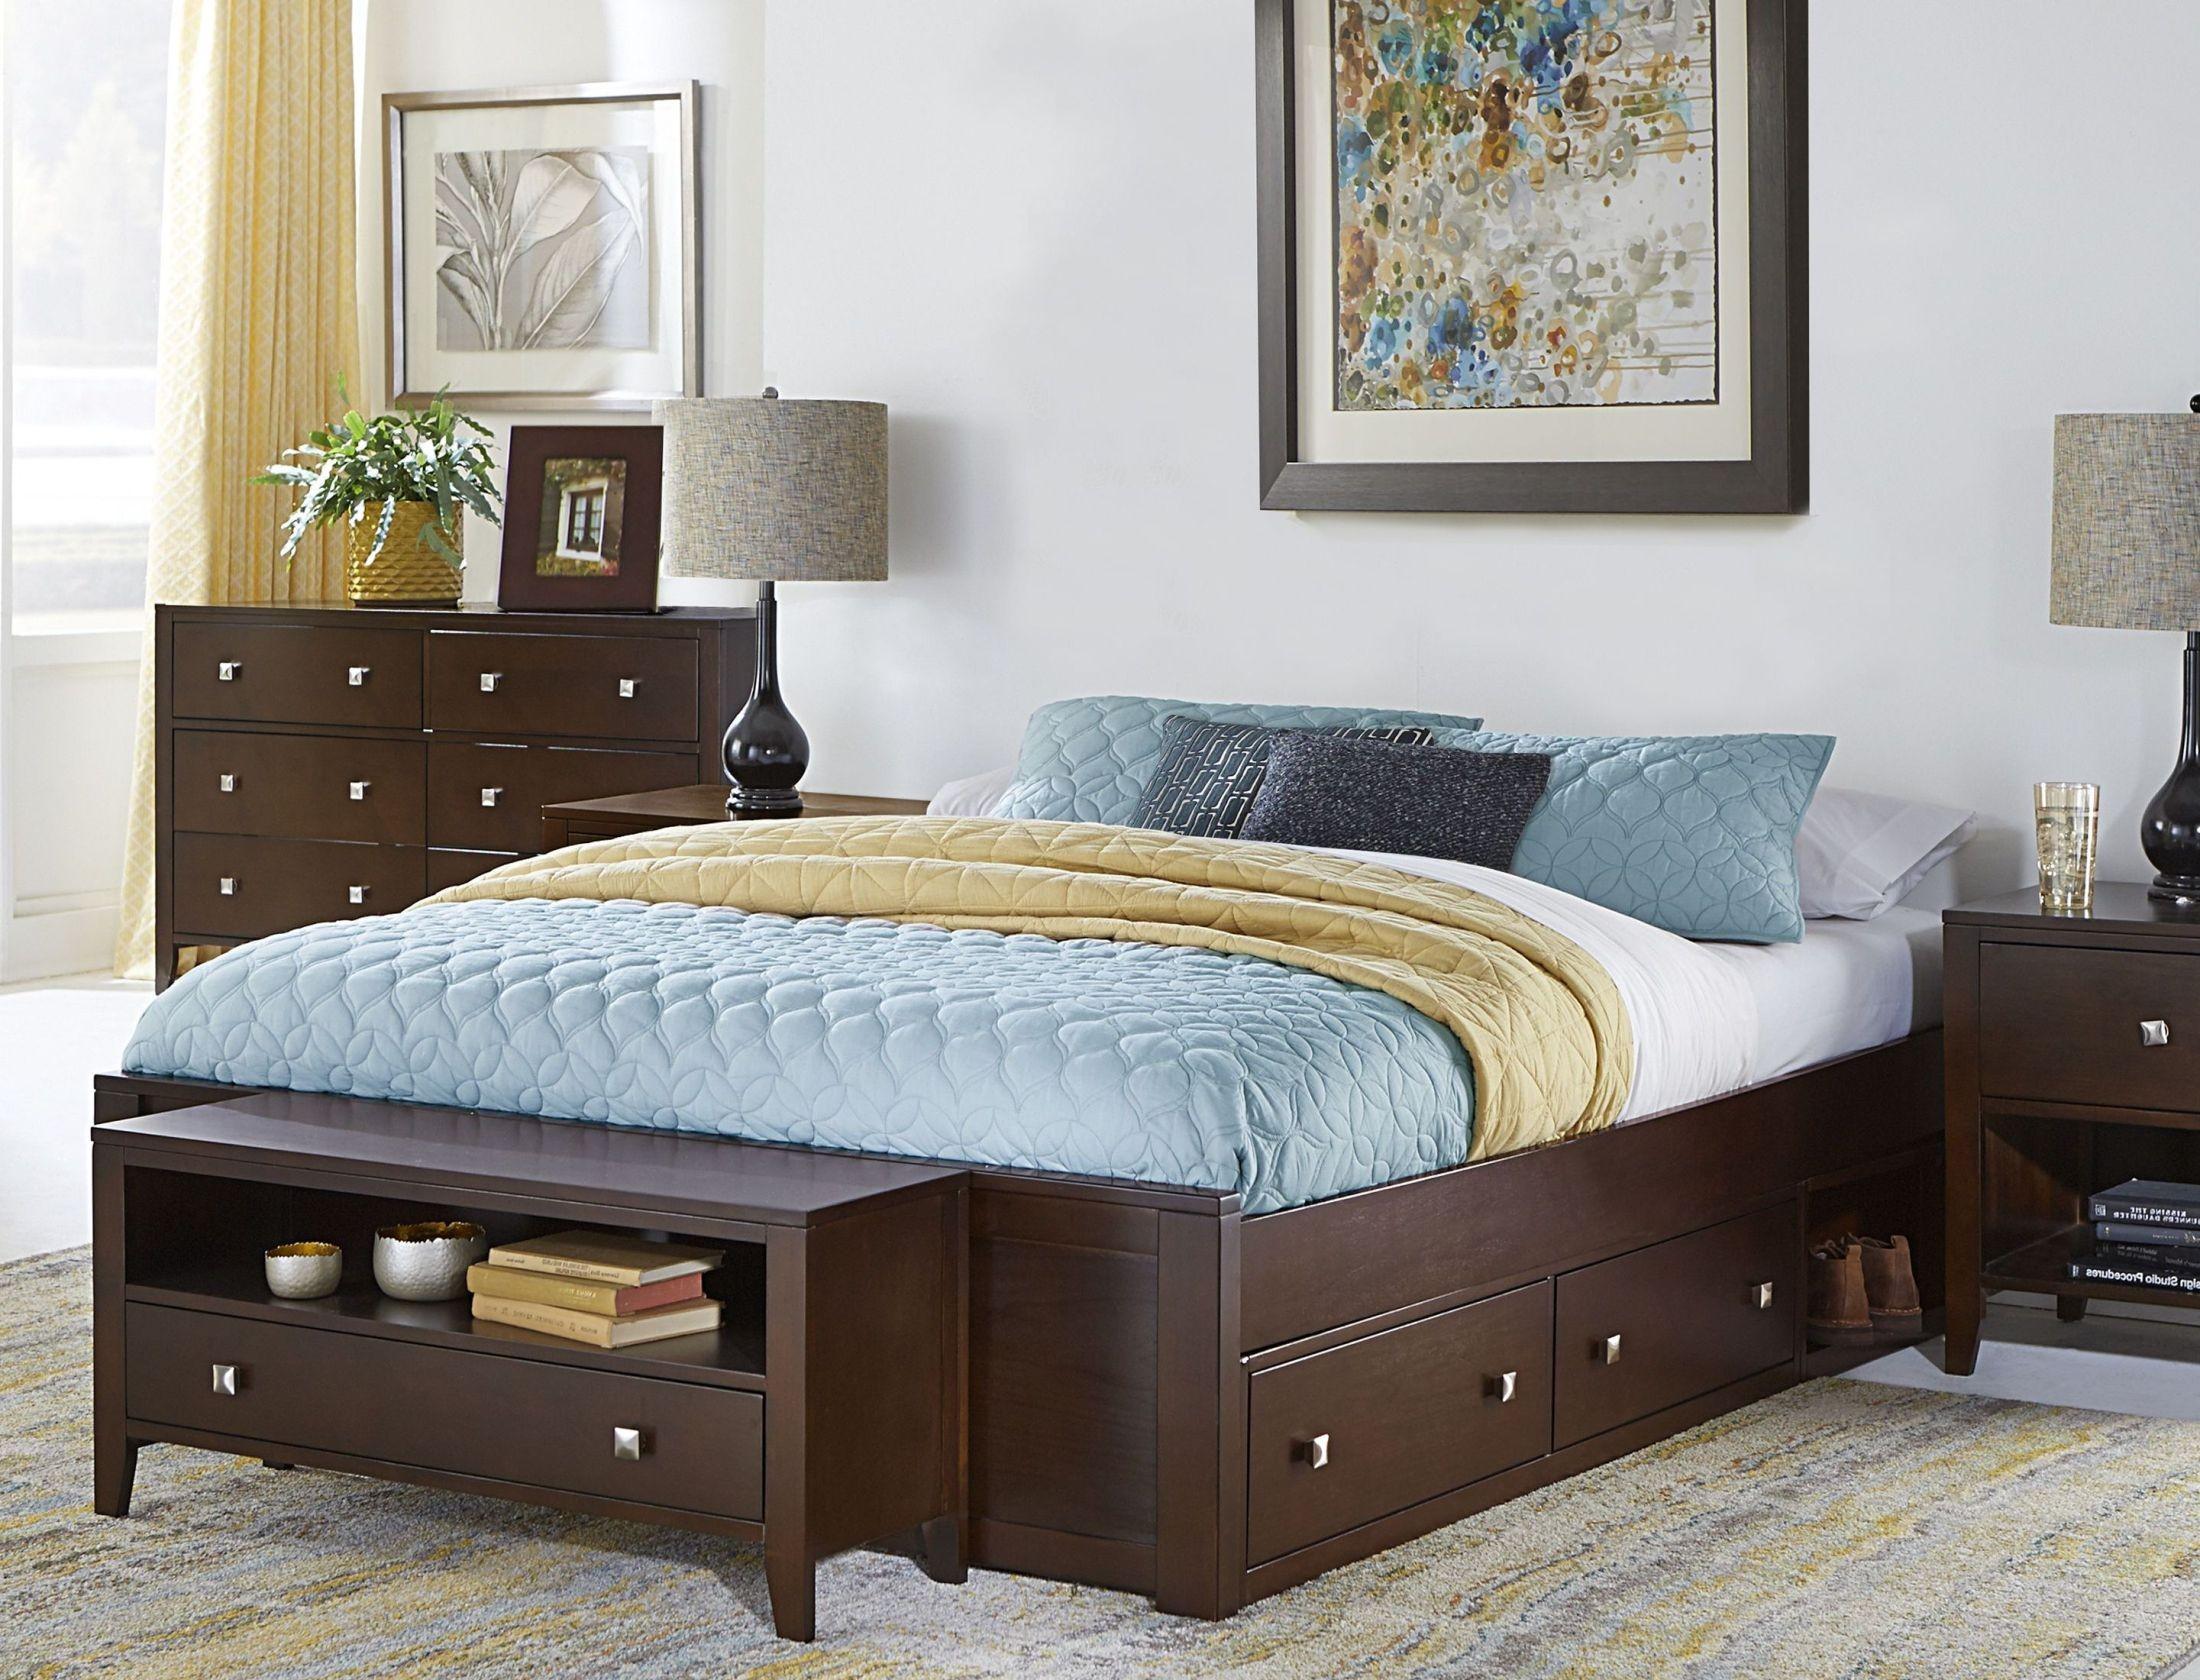 Pulse chocolate platform bedroom set with storage from ne - Platform bedroom sets with storage ...